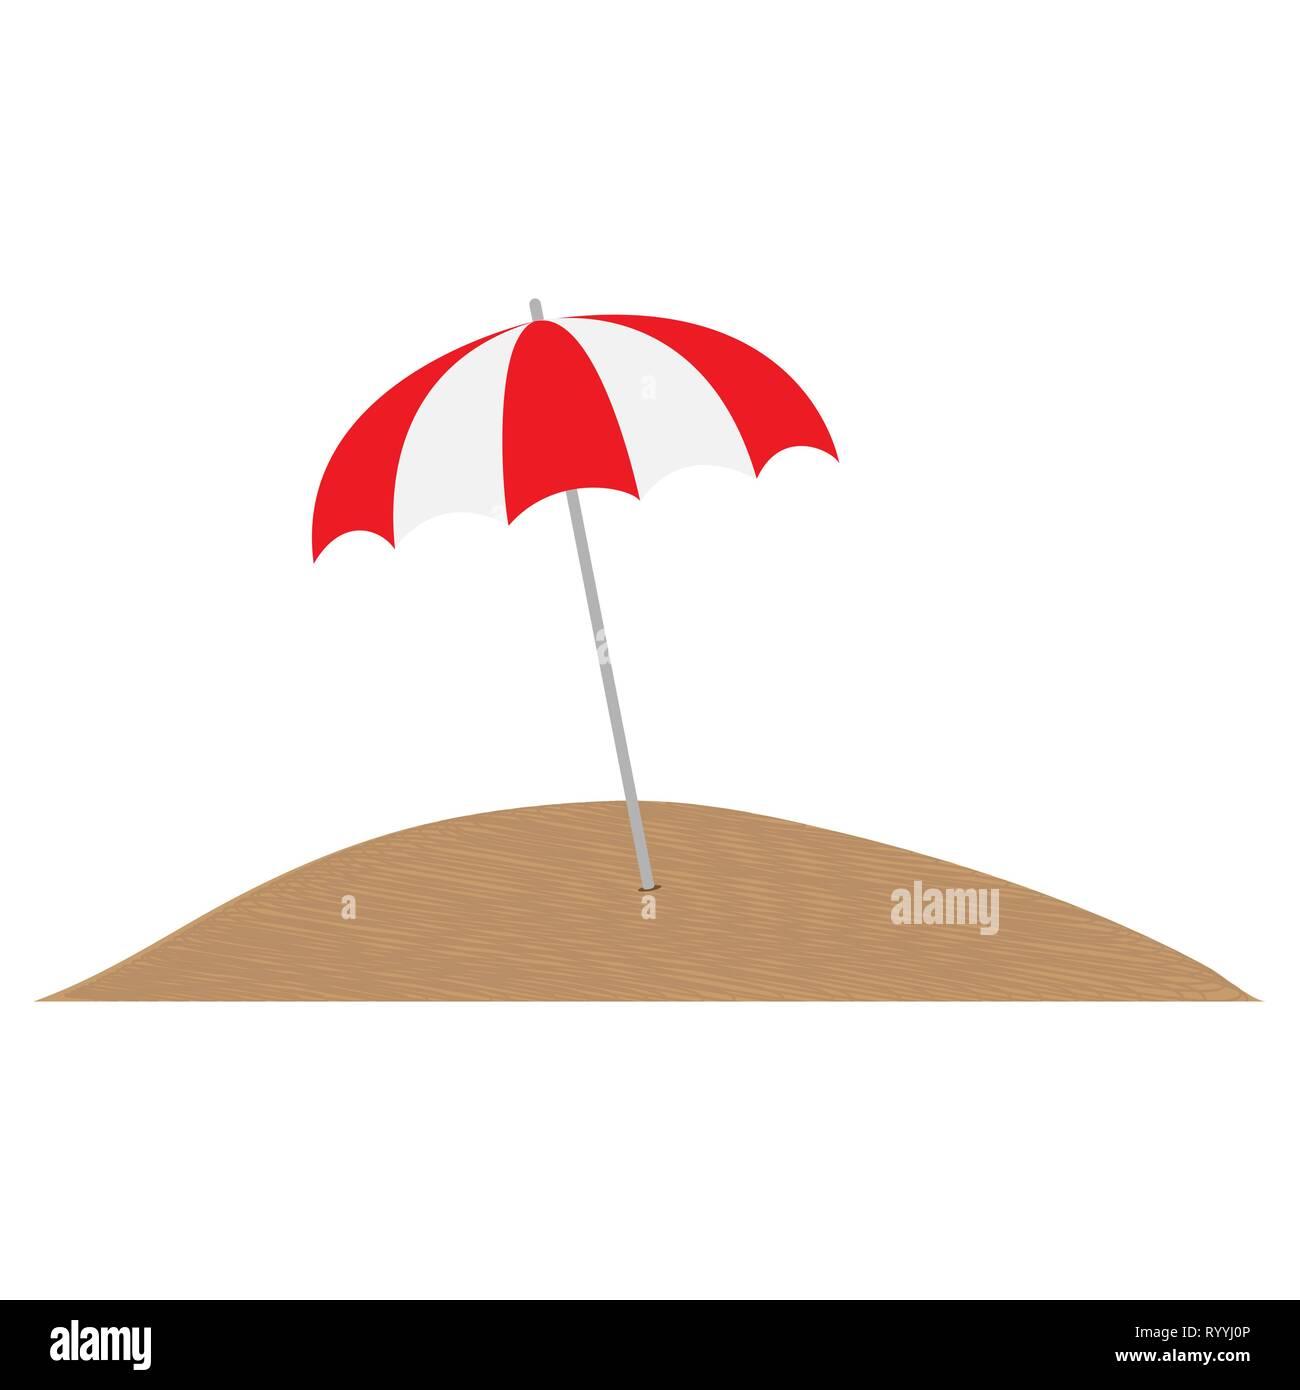 Multi-colored umbrella from the sun in the sand, simple design - Stock Vector